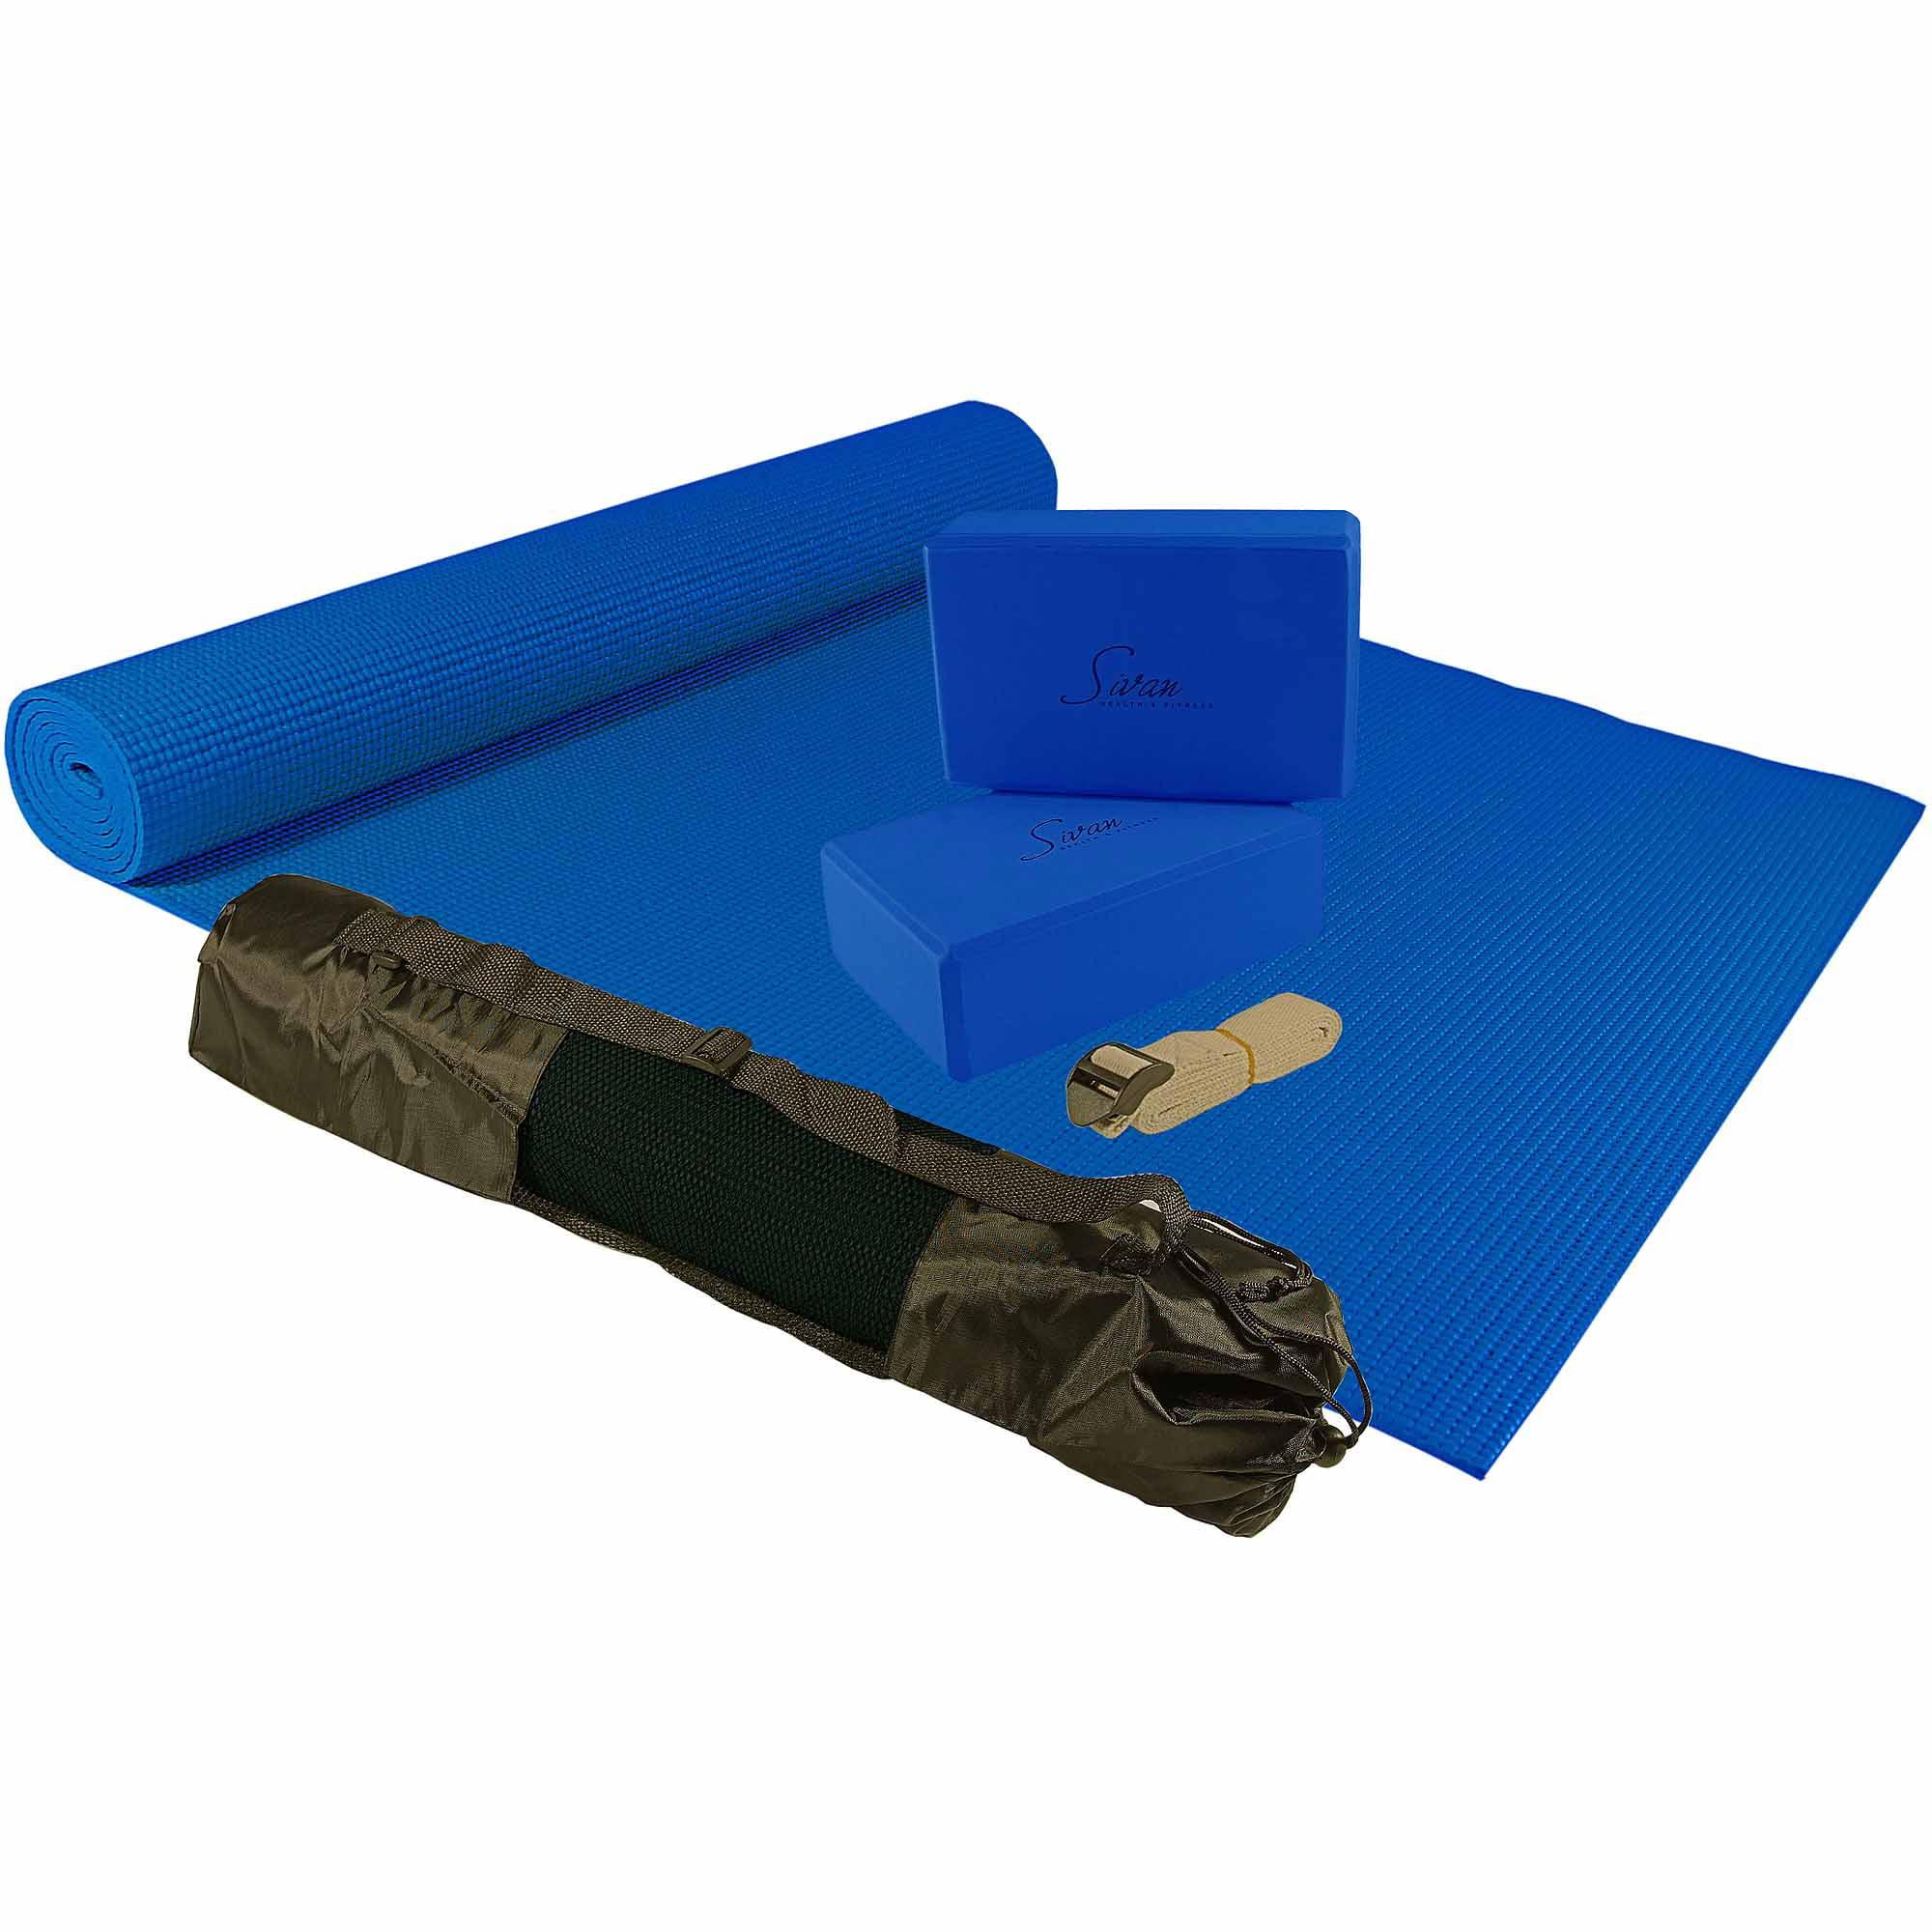 Sivan Health & Fitness Prepacked 5-Piece Yoga Kit, Blue